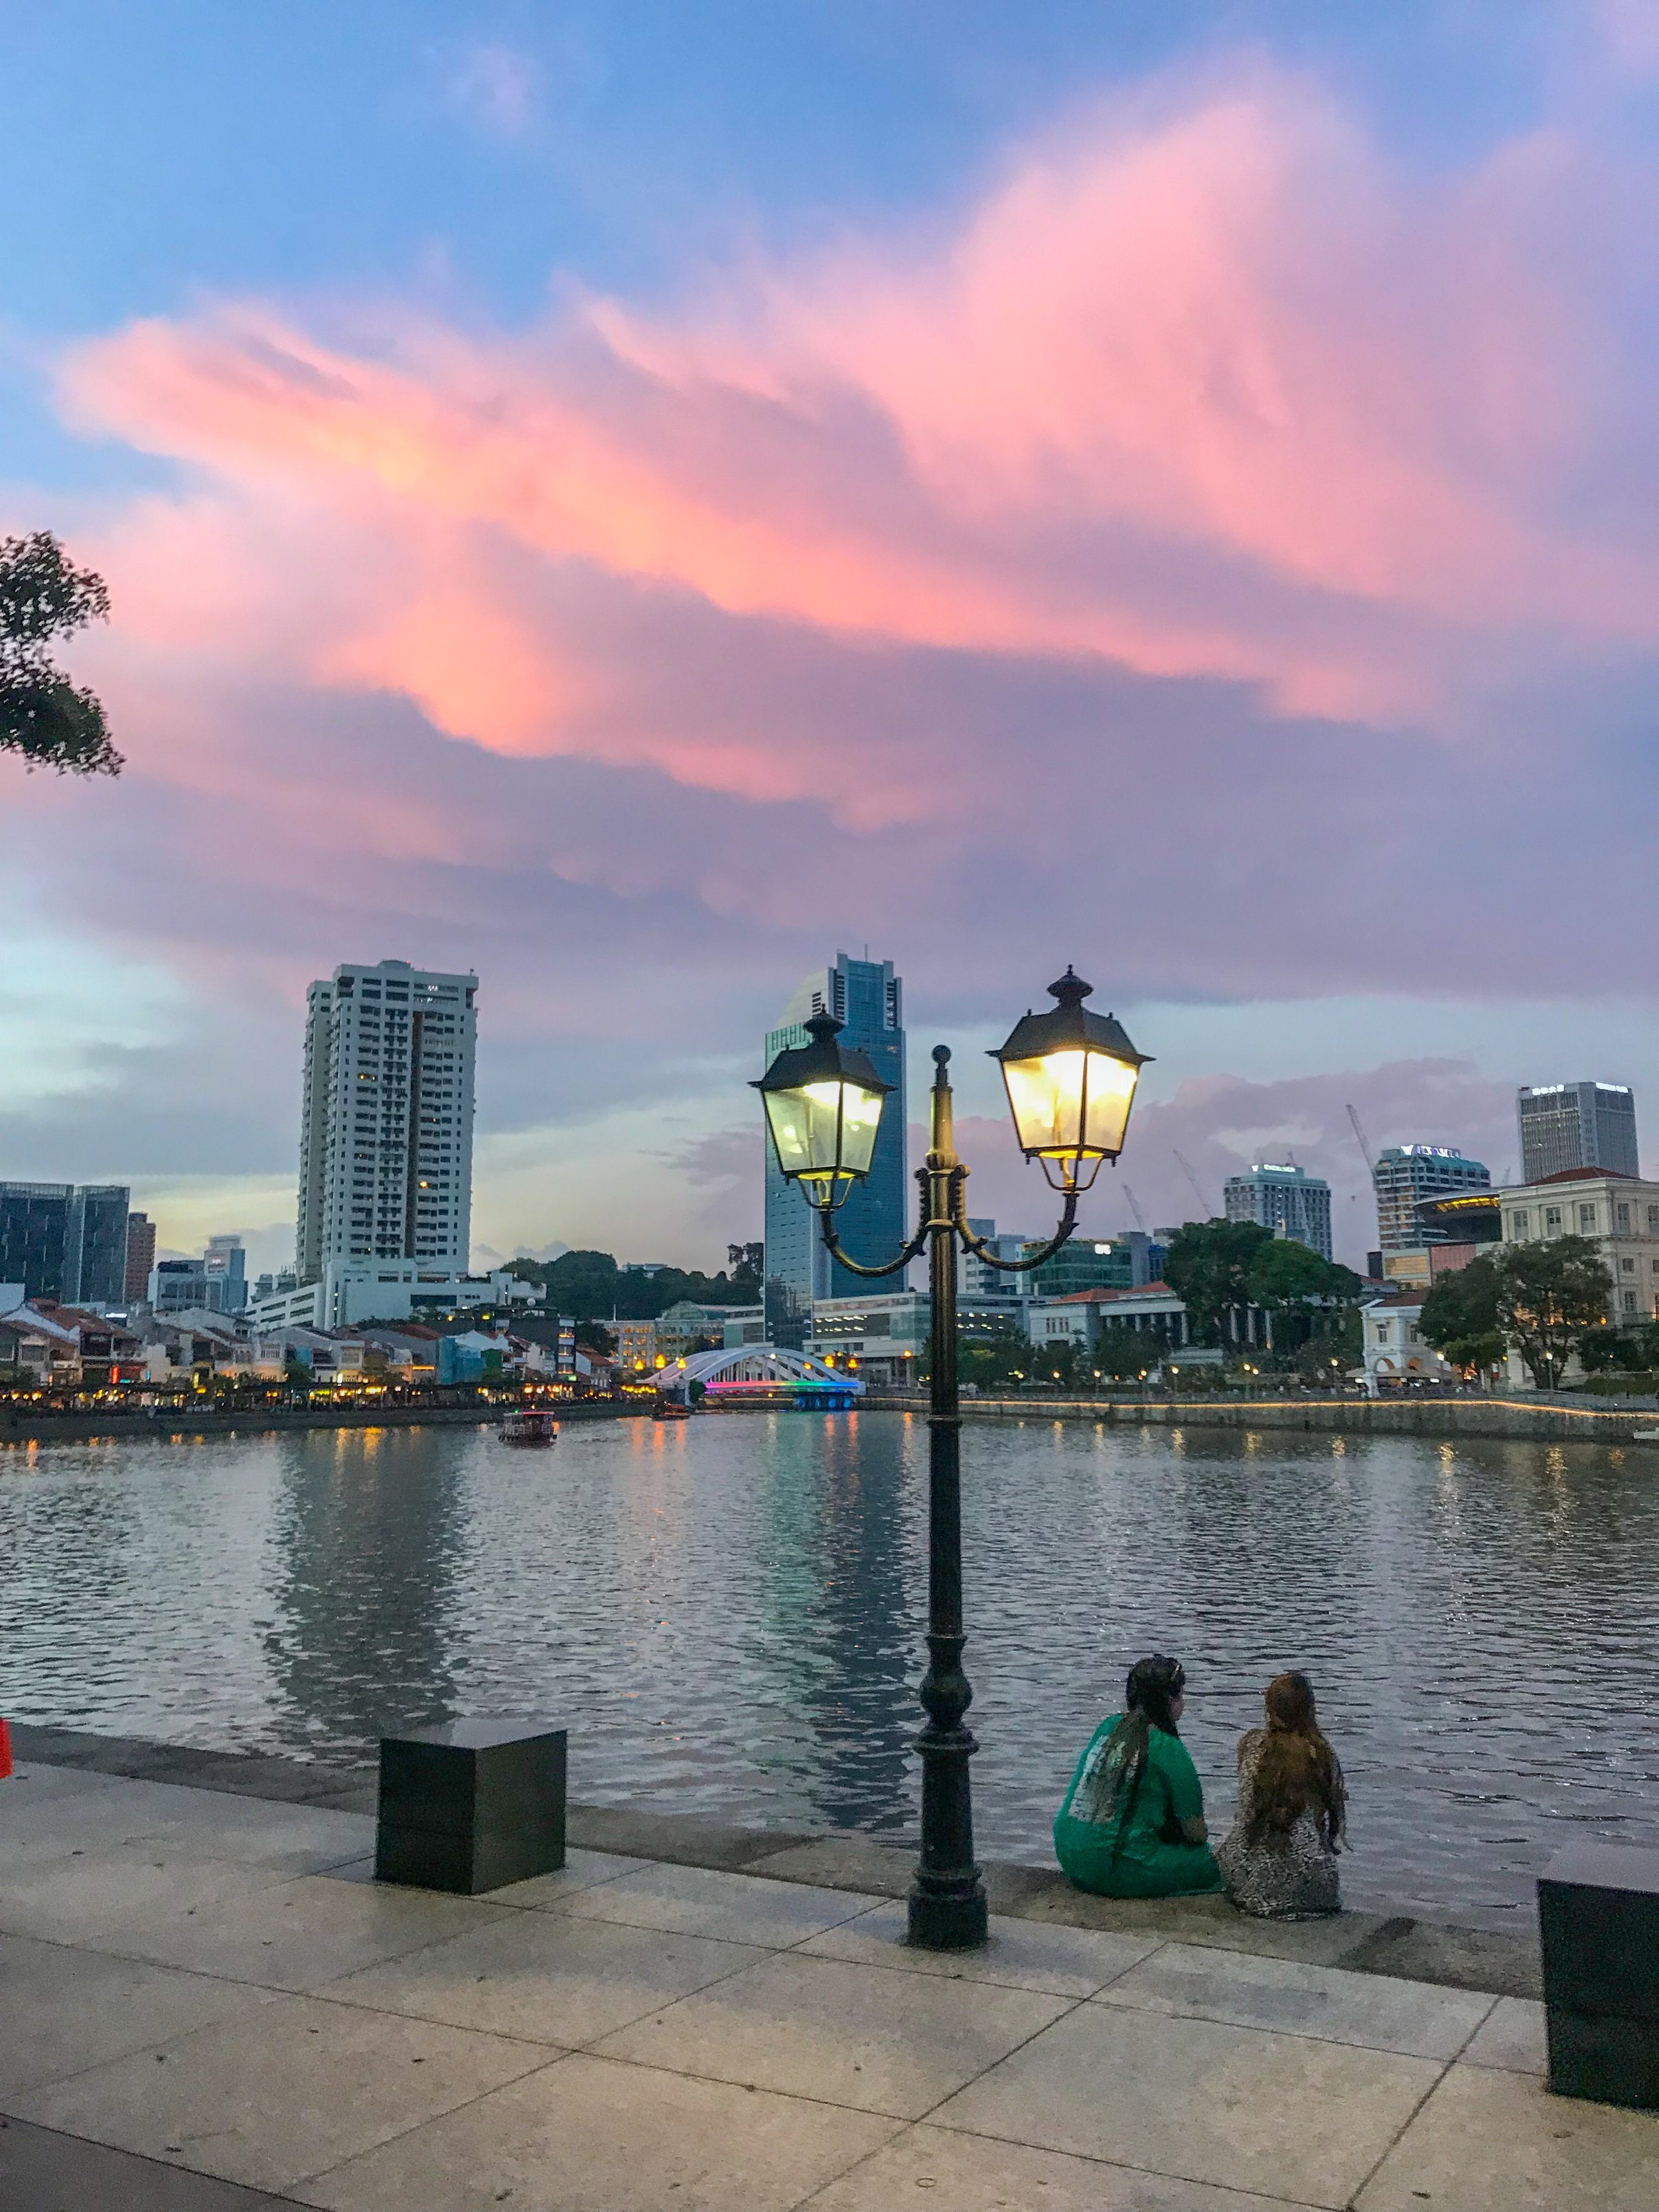 Sunset in Clarke Quay